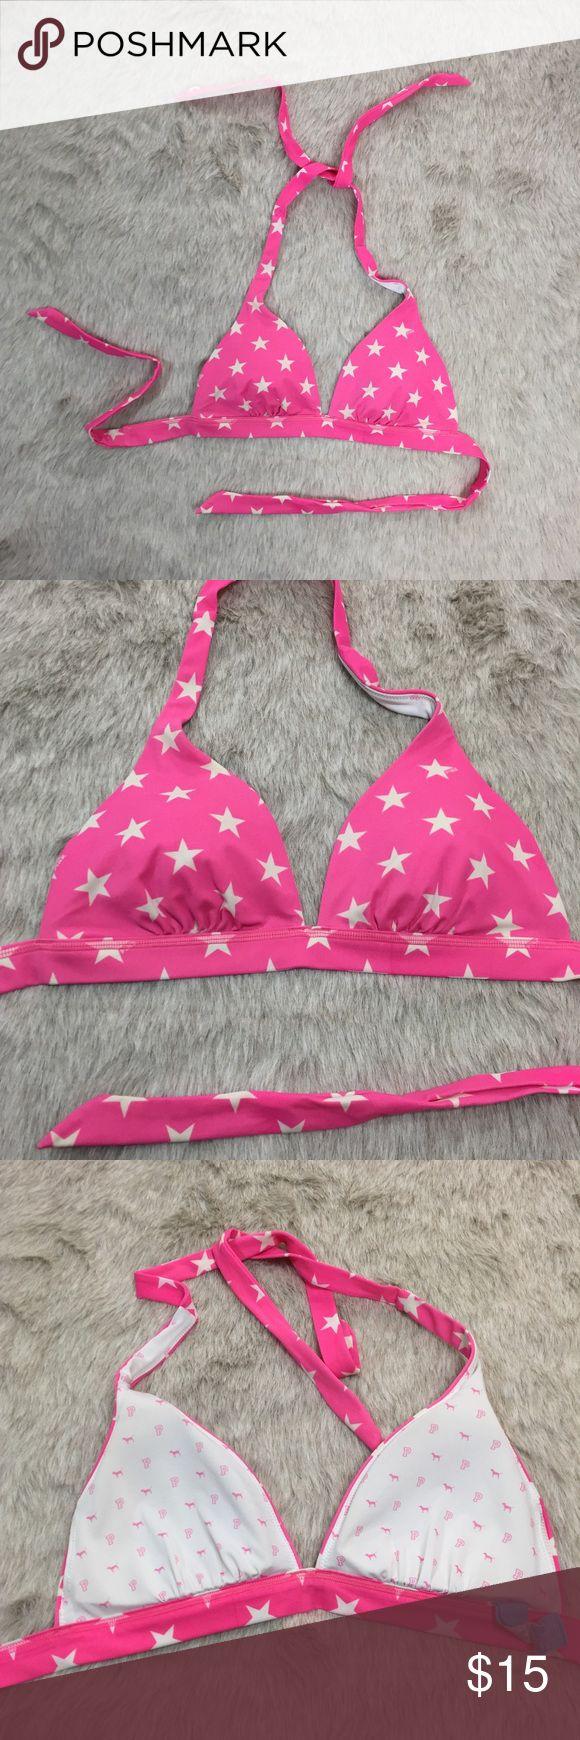 VS Pink star print triangle tie bikini top S Pre-loved VS Pink triangle tie bikini top with star print. Dog print inside. Removable pads in the cups. PINK Victoria's Secret Swim Bikinis